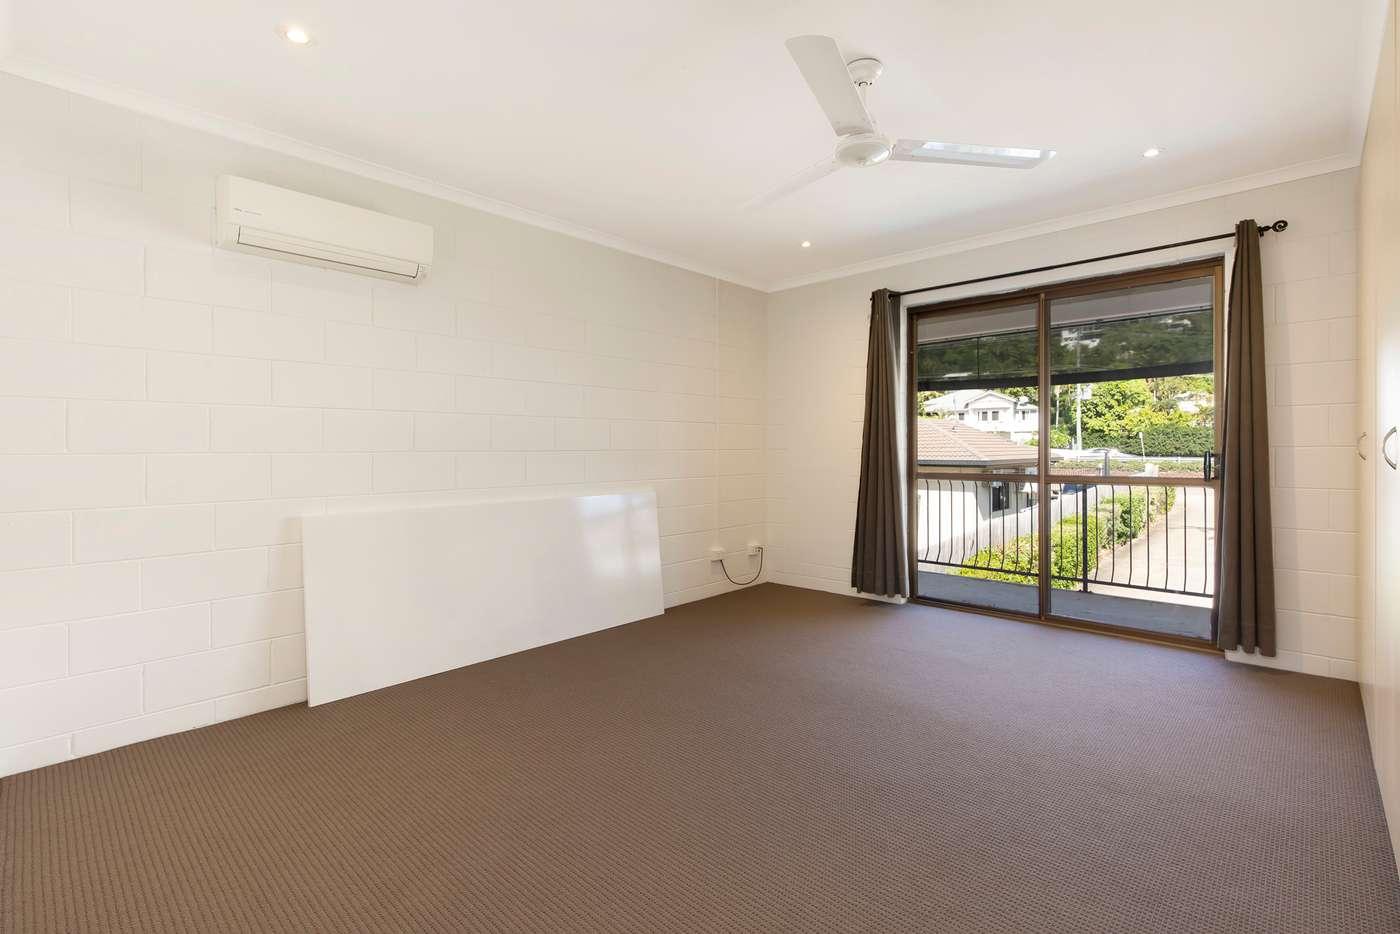 Sixth view of Homely unit listing, 5/47 Warburton Street, North Ward QLD 4810